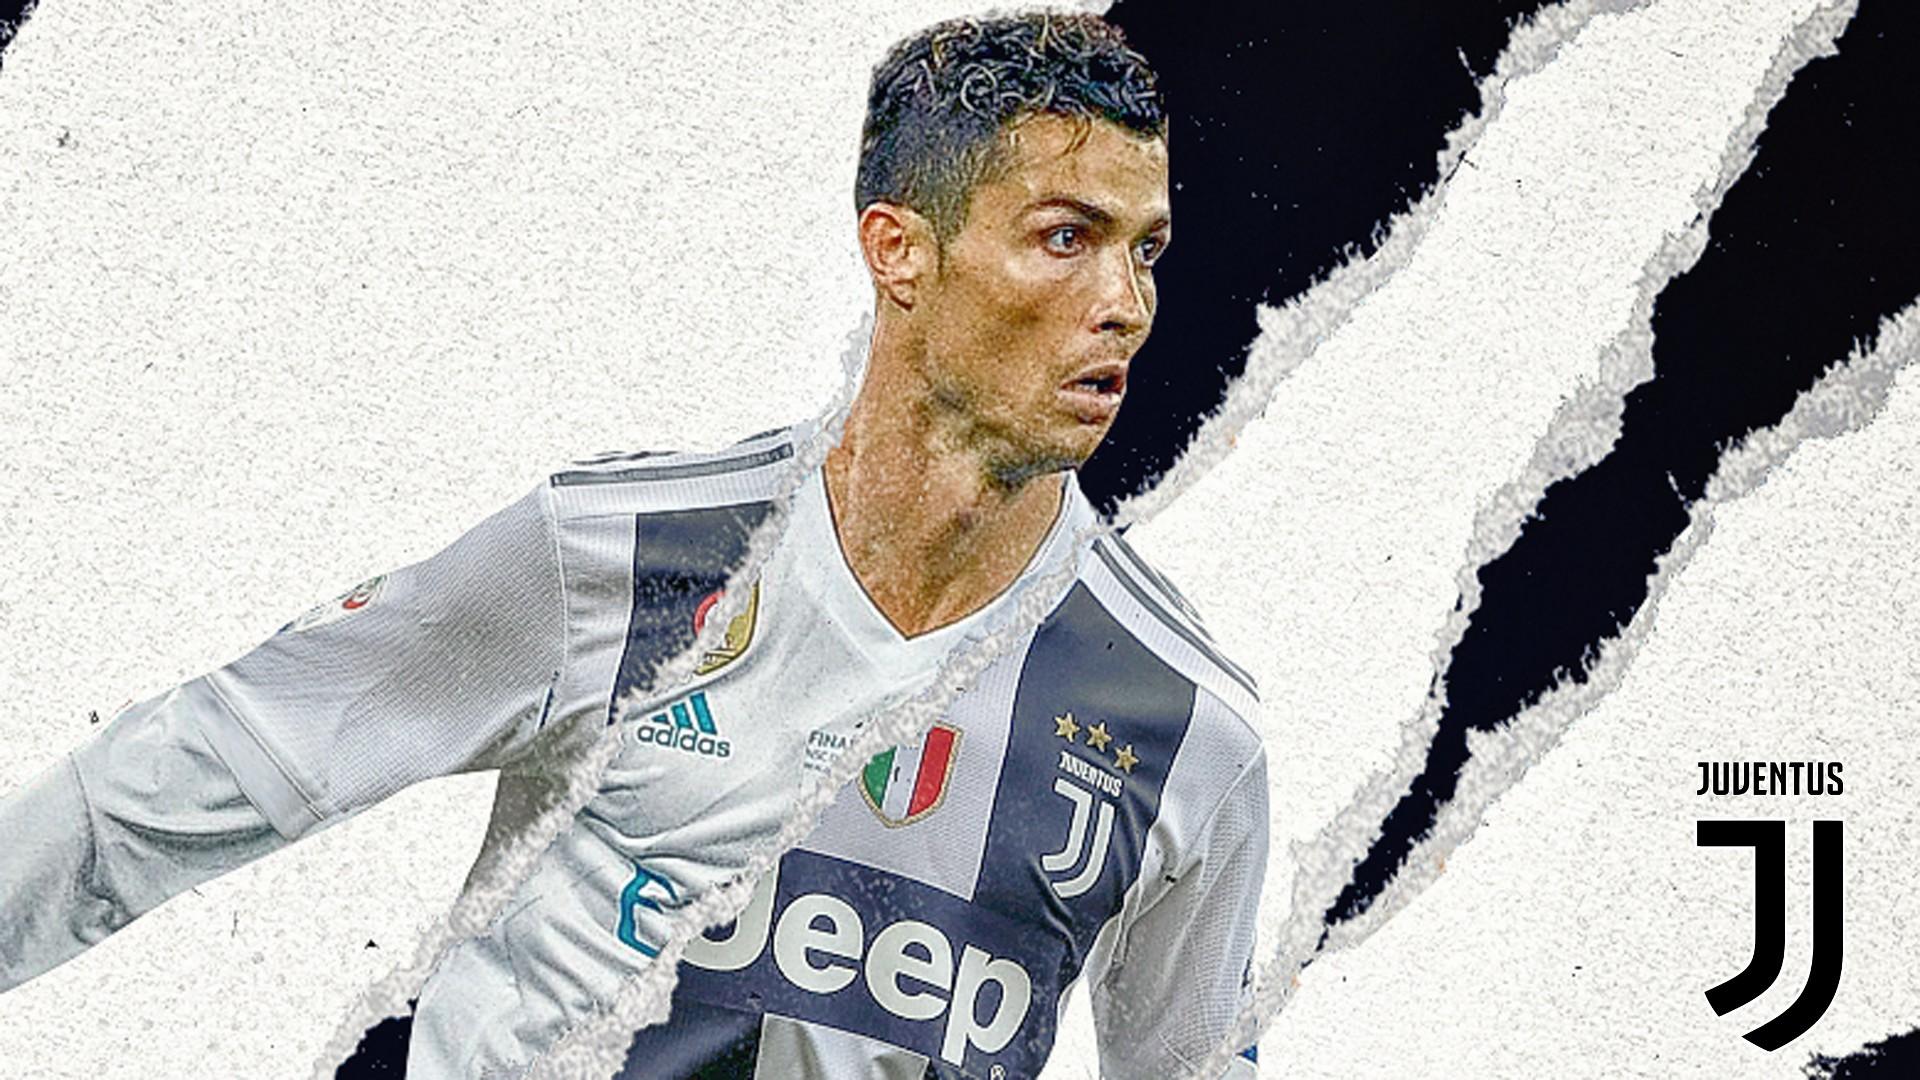 Iphone X Dimensions For Wallpaper 18 9 Cr7 Juventus Hd Wallpapers 2019 Football Wallpaper